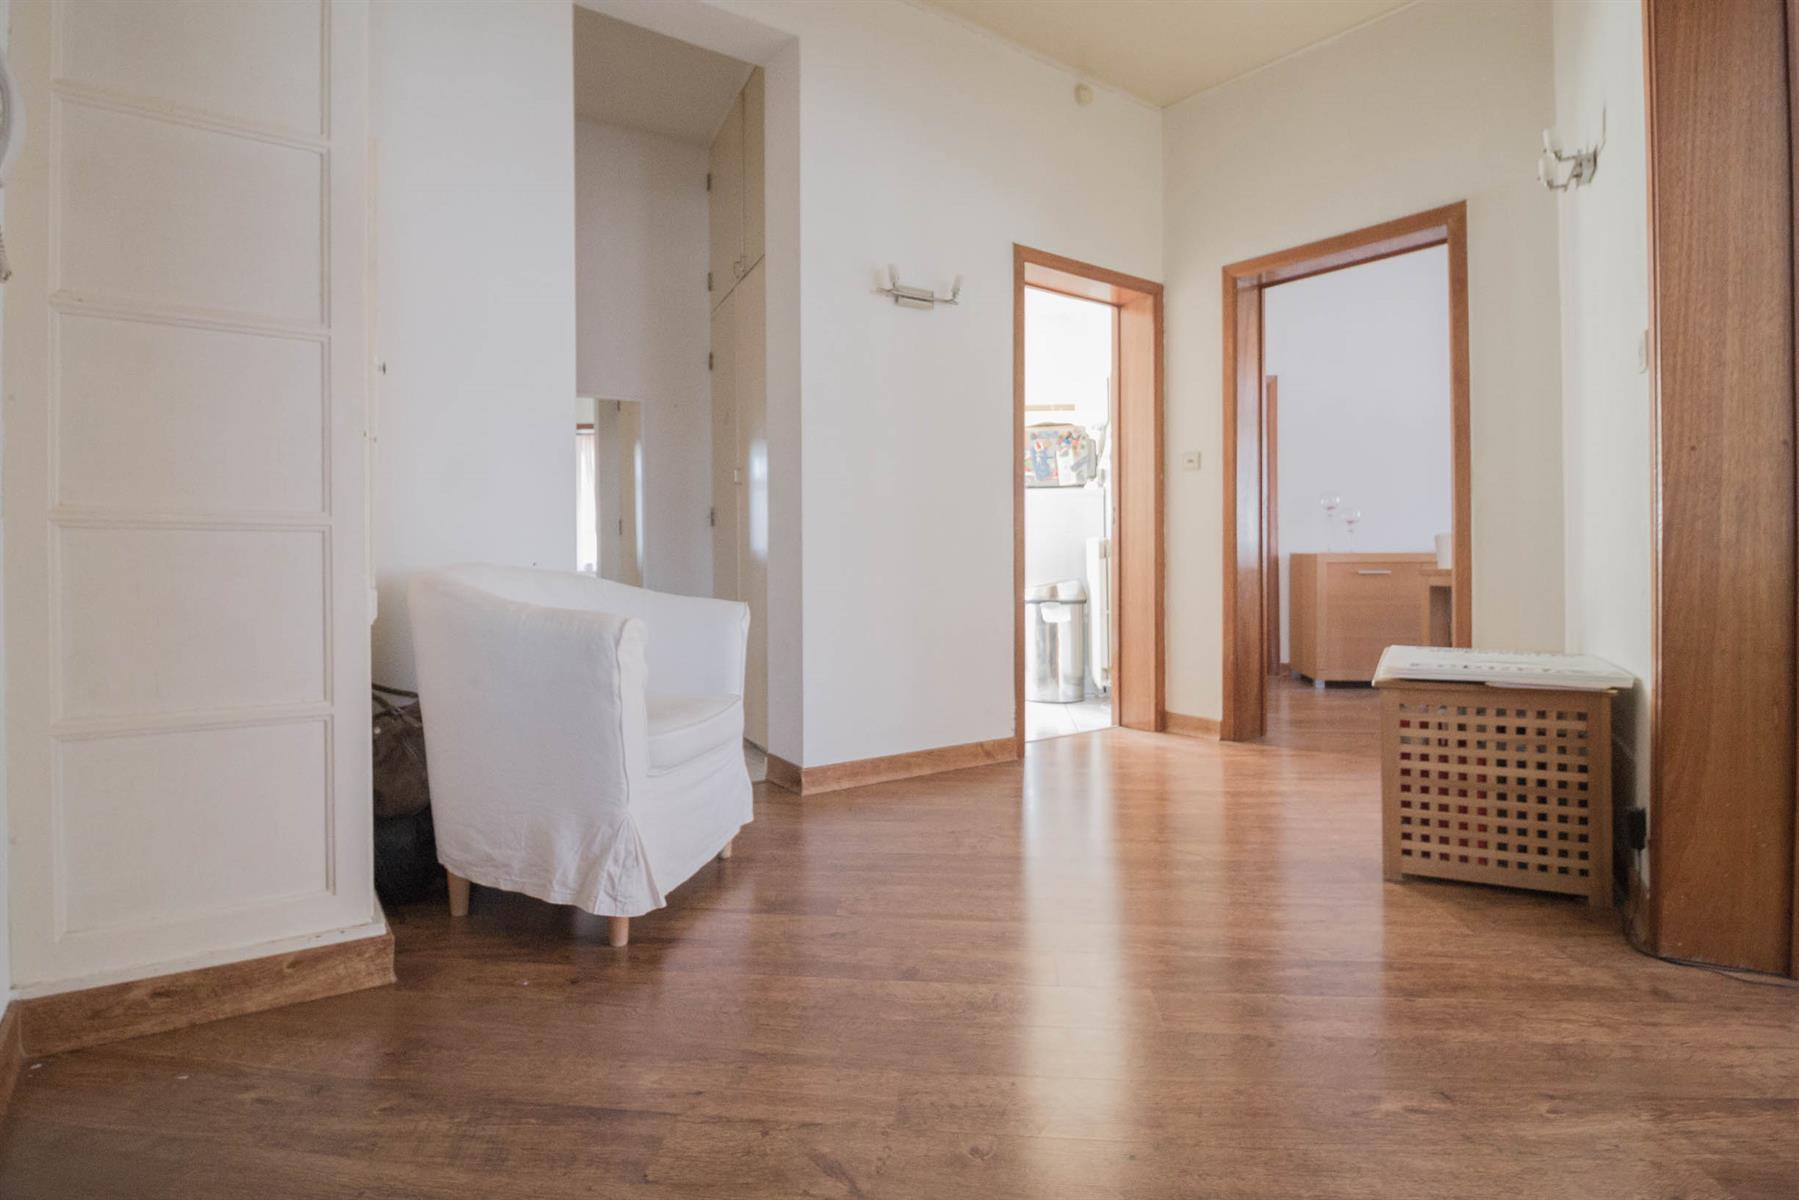 Appartement - Charleroi - #4416667-2